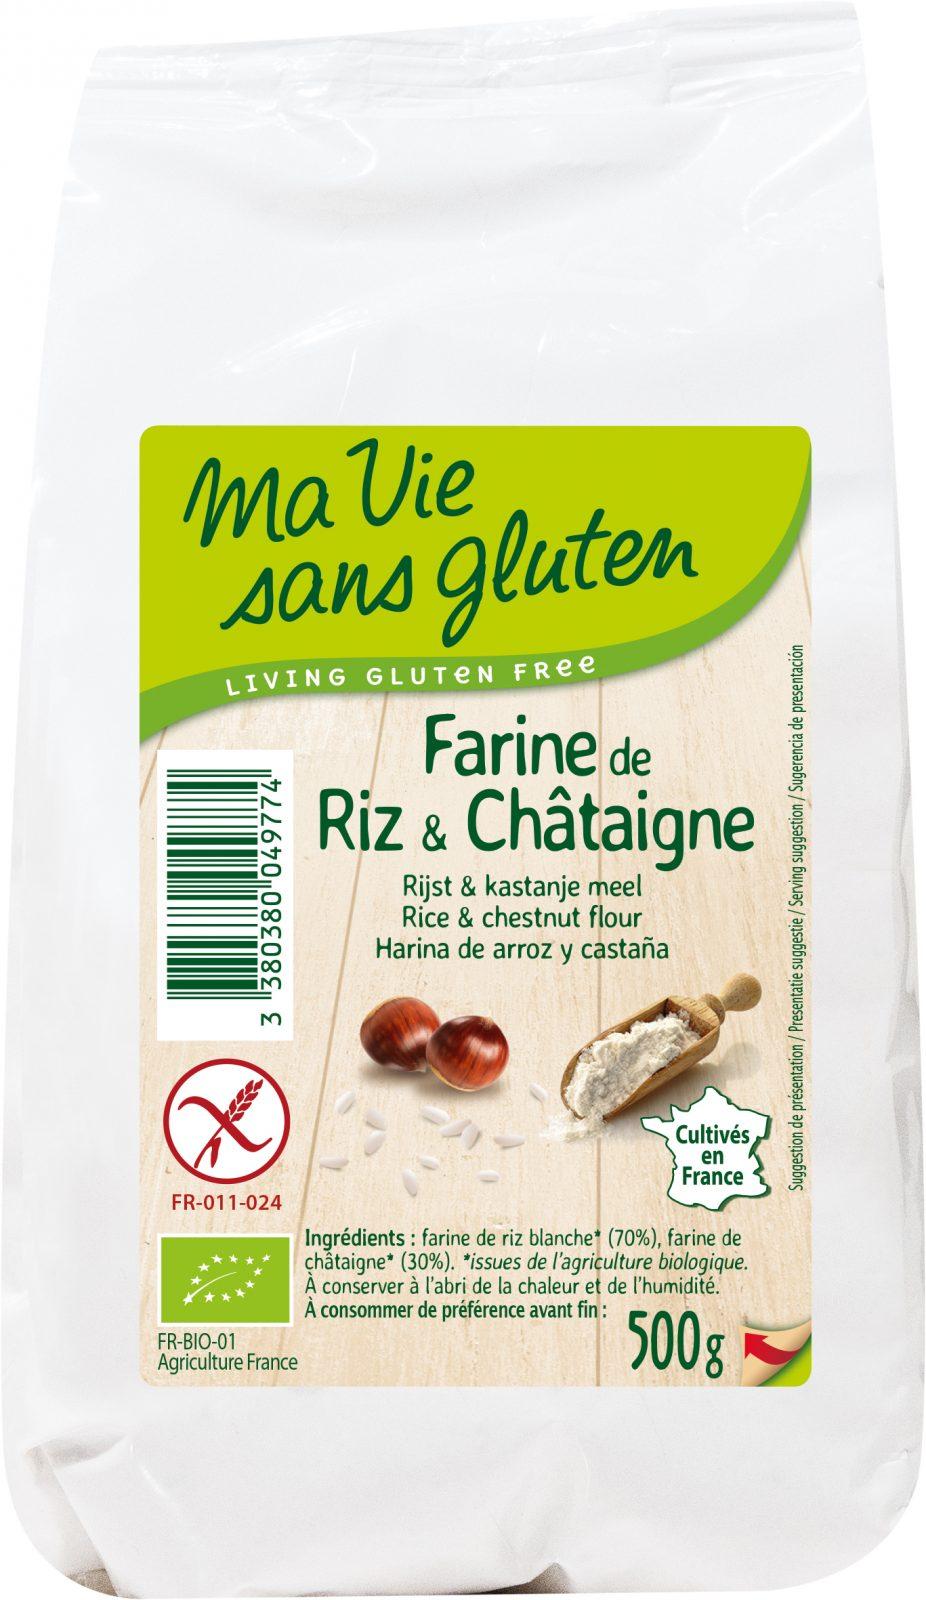 Ma vie sans gluten - Farines sans gluten - Farine de riz & châtaigne 500 g